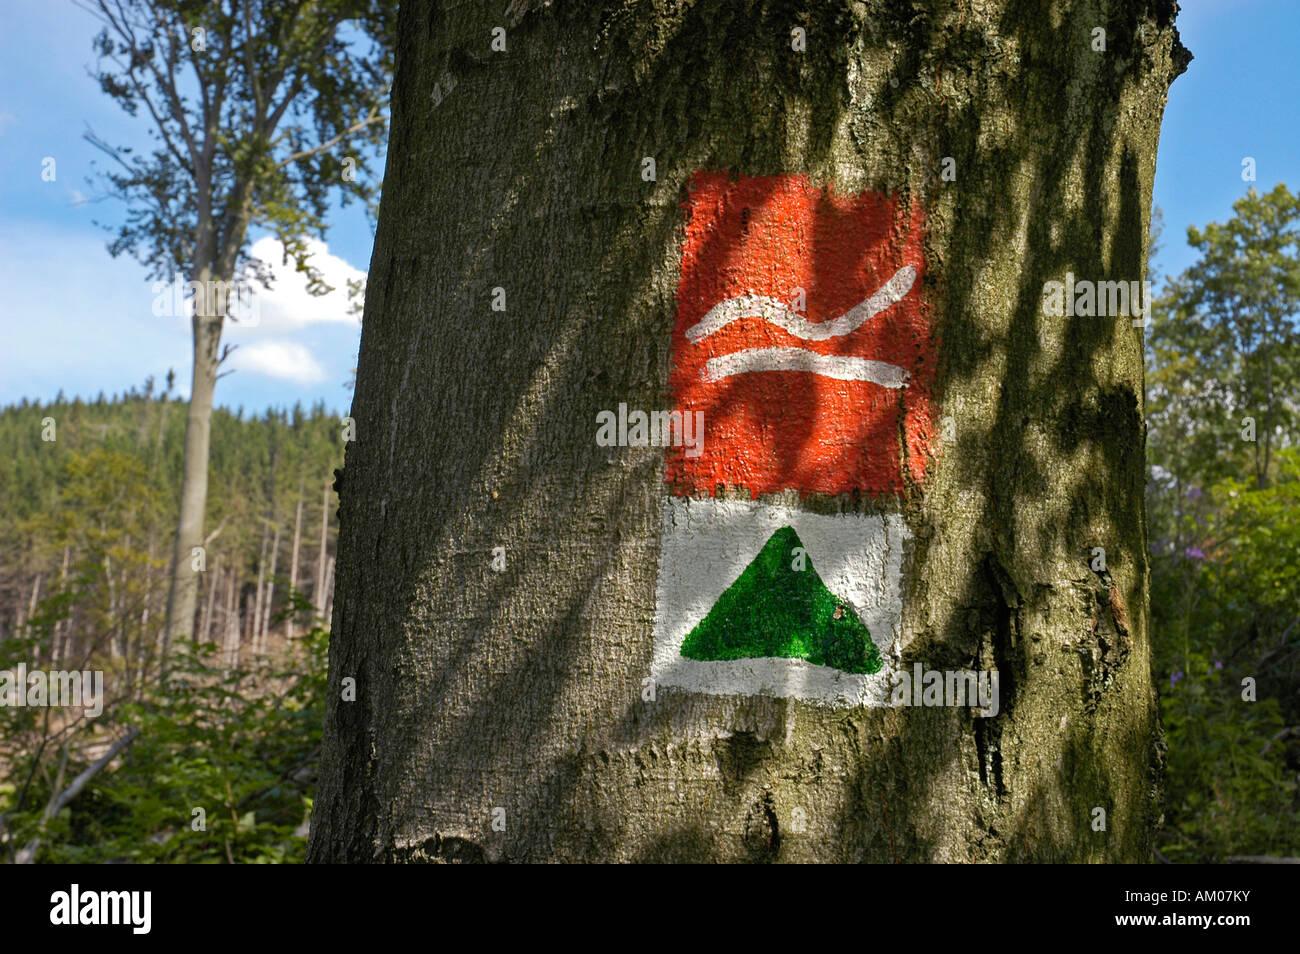 Sign, Rothaarsteig hiking trail, North Rhine-Westphalia, Germany Stock Photo